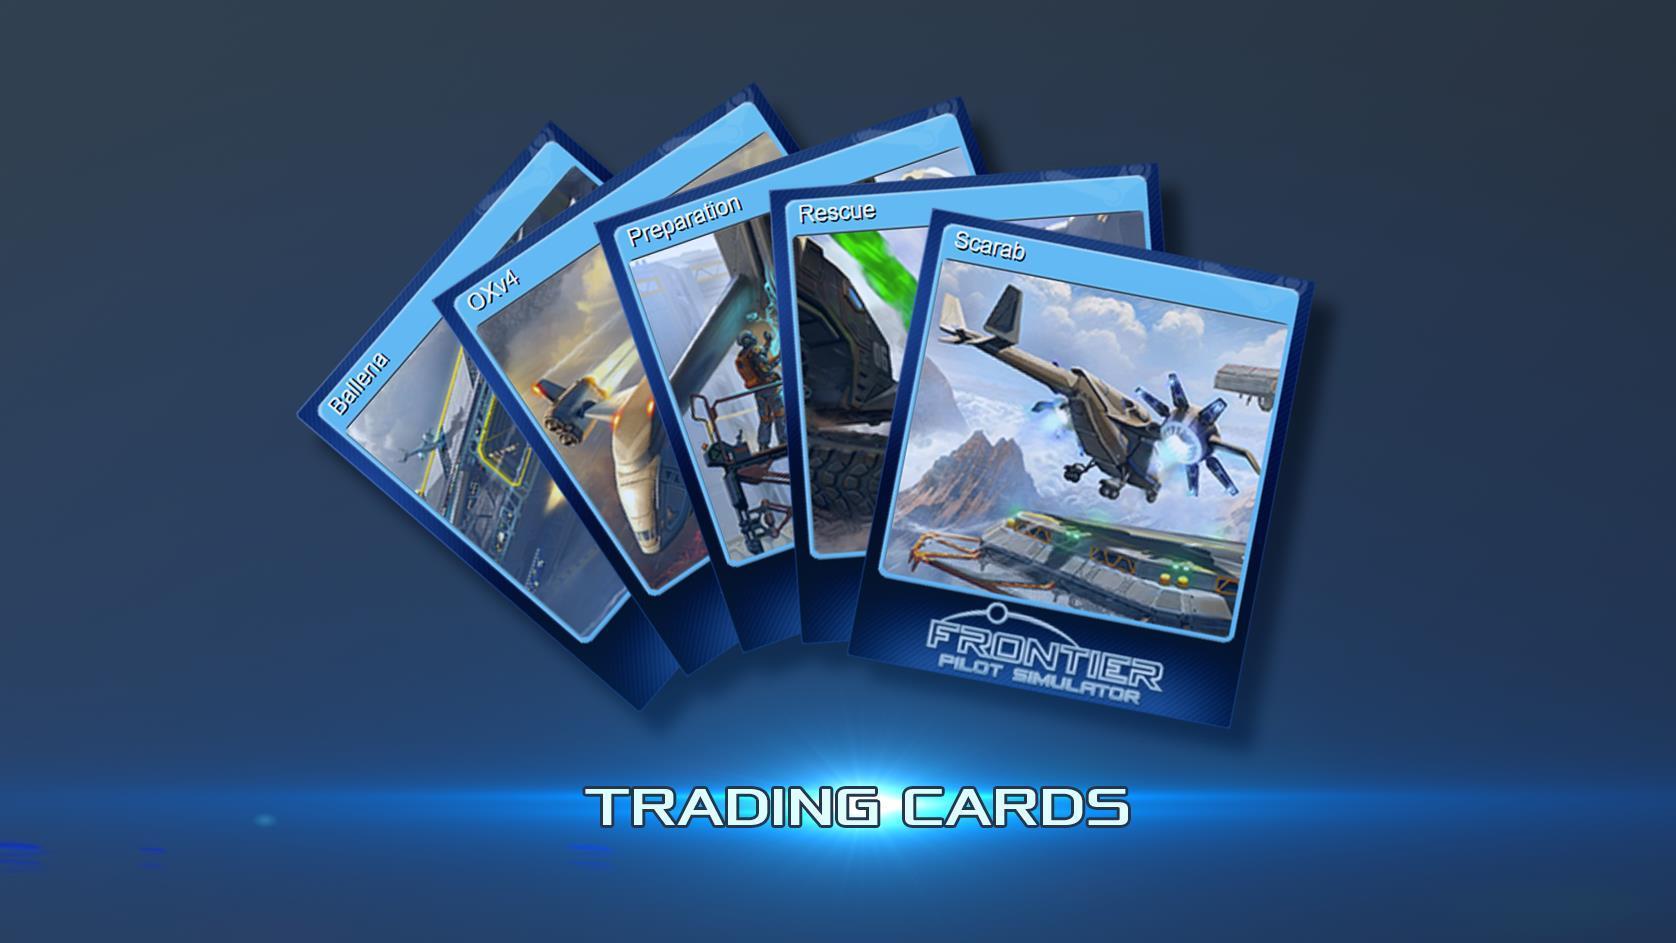 announcement  u2013 stream  trading cards  updates  u2013 frontier